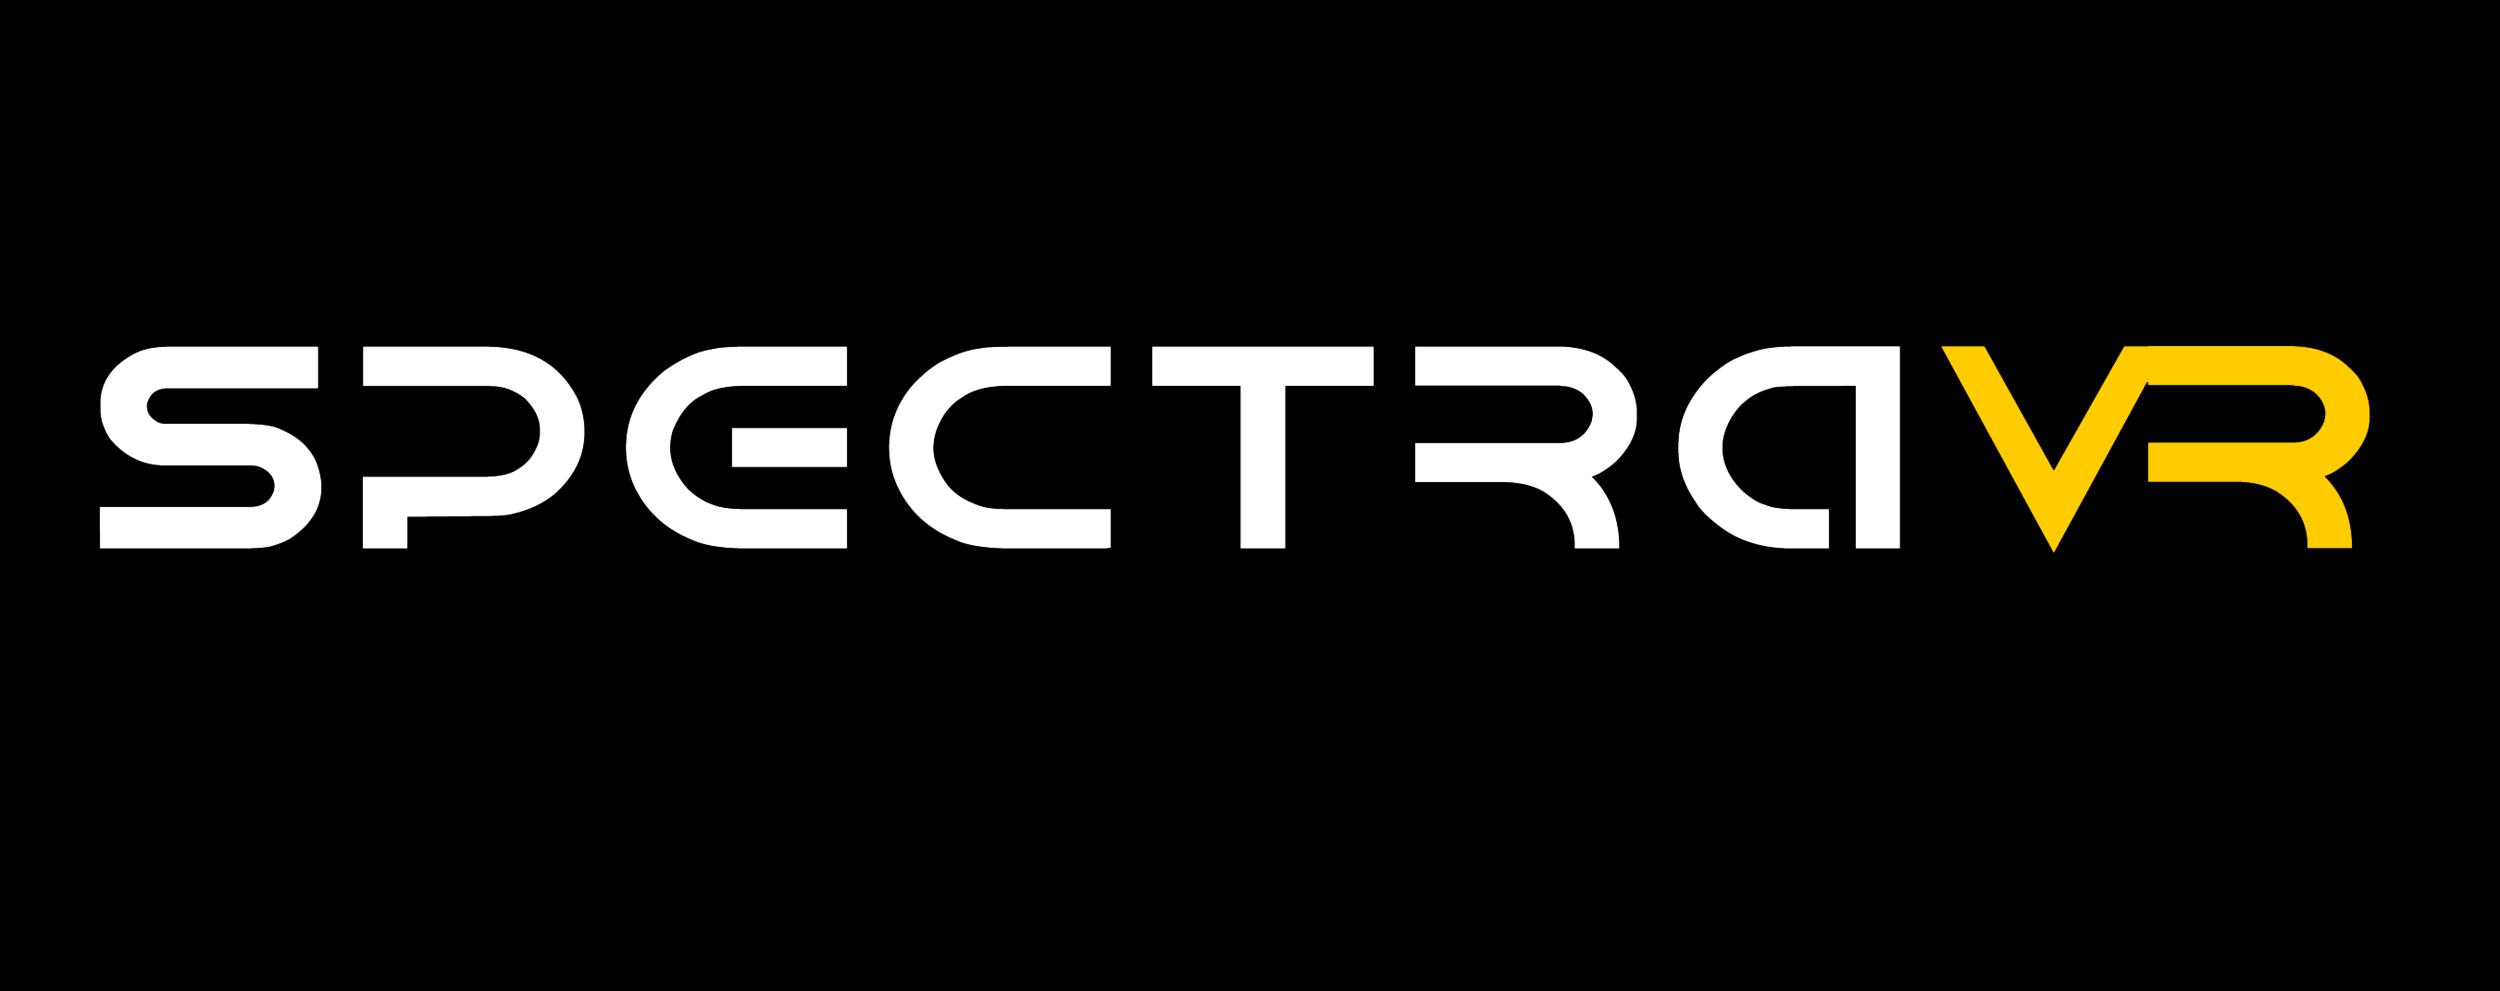 spectravr logo.png